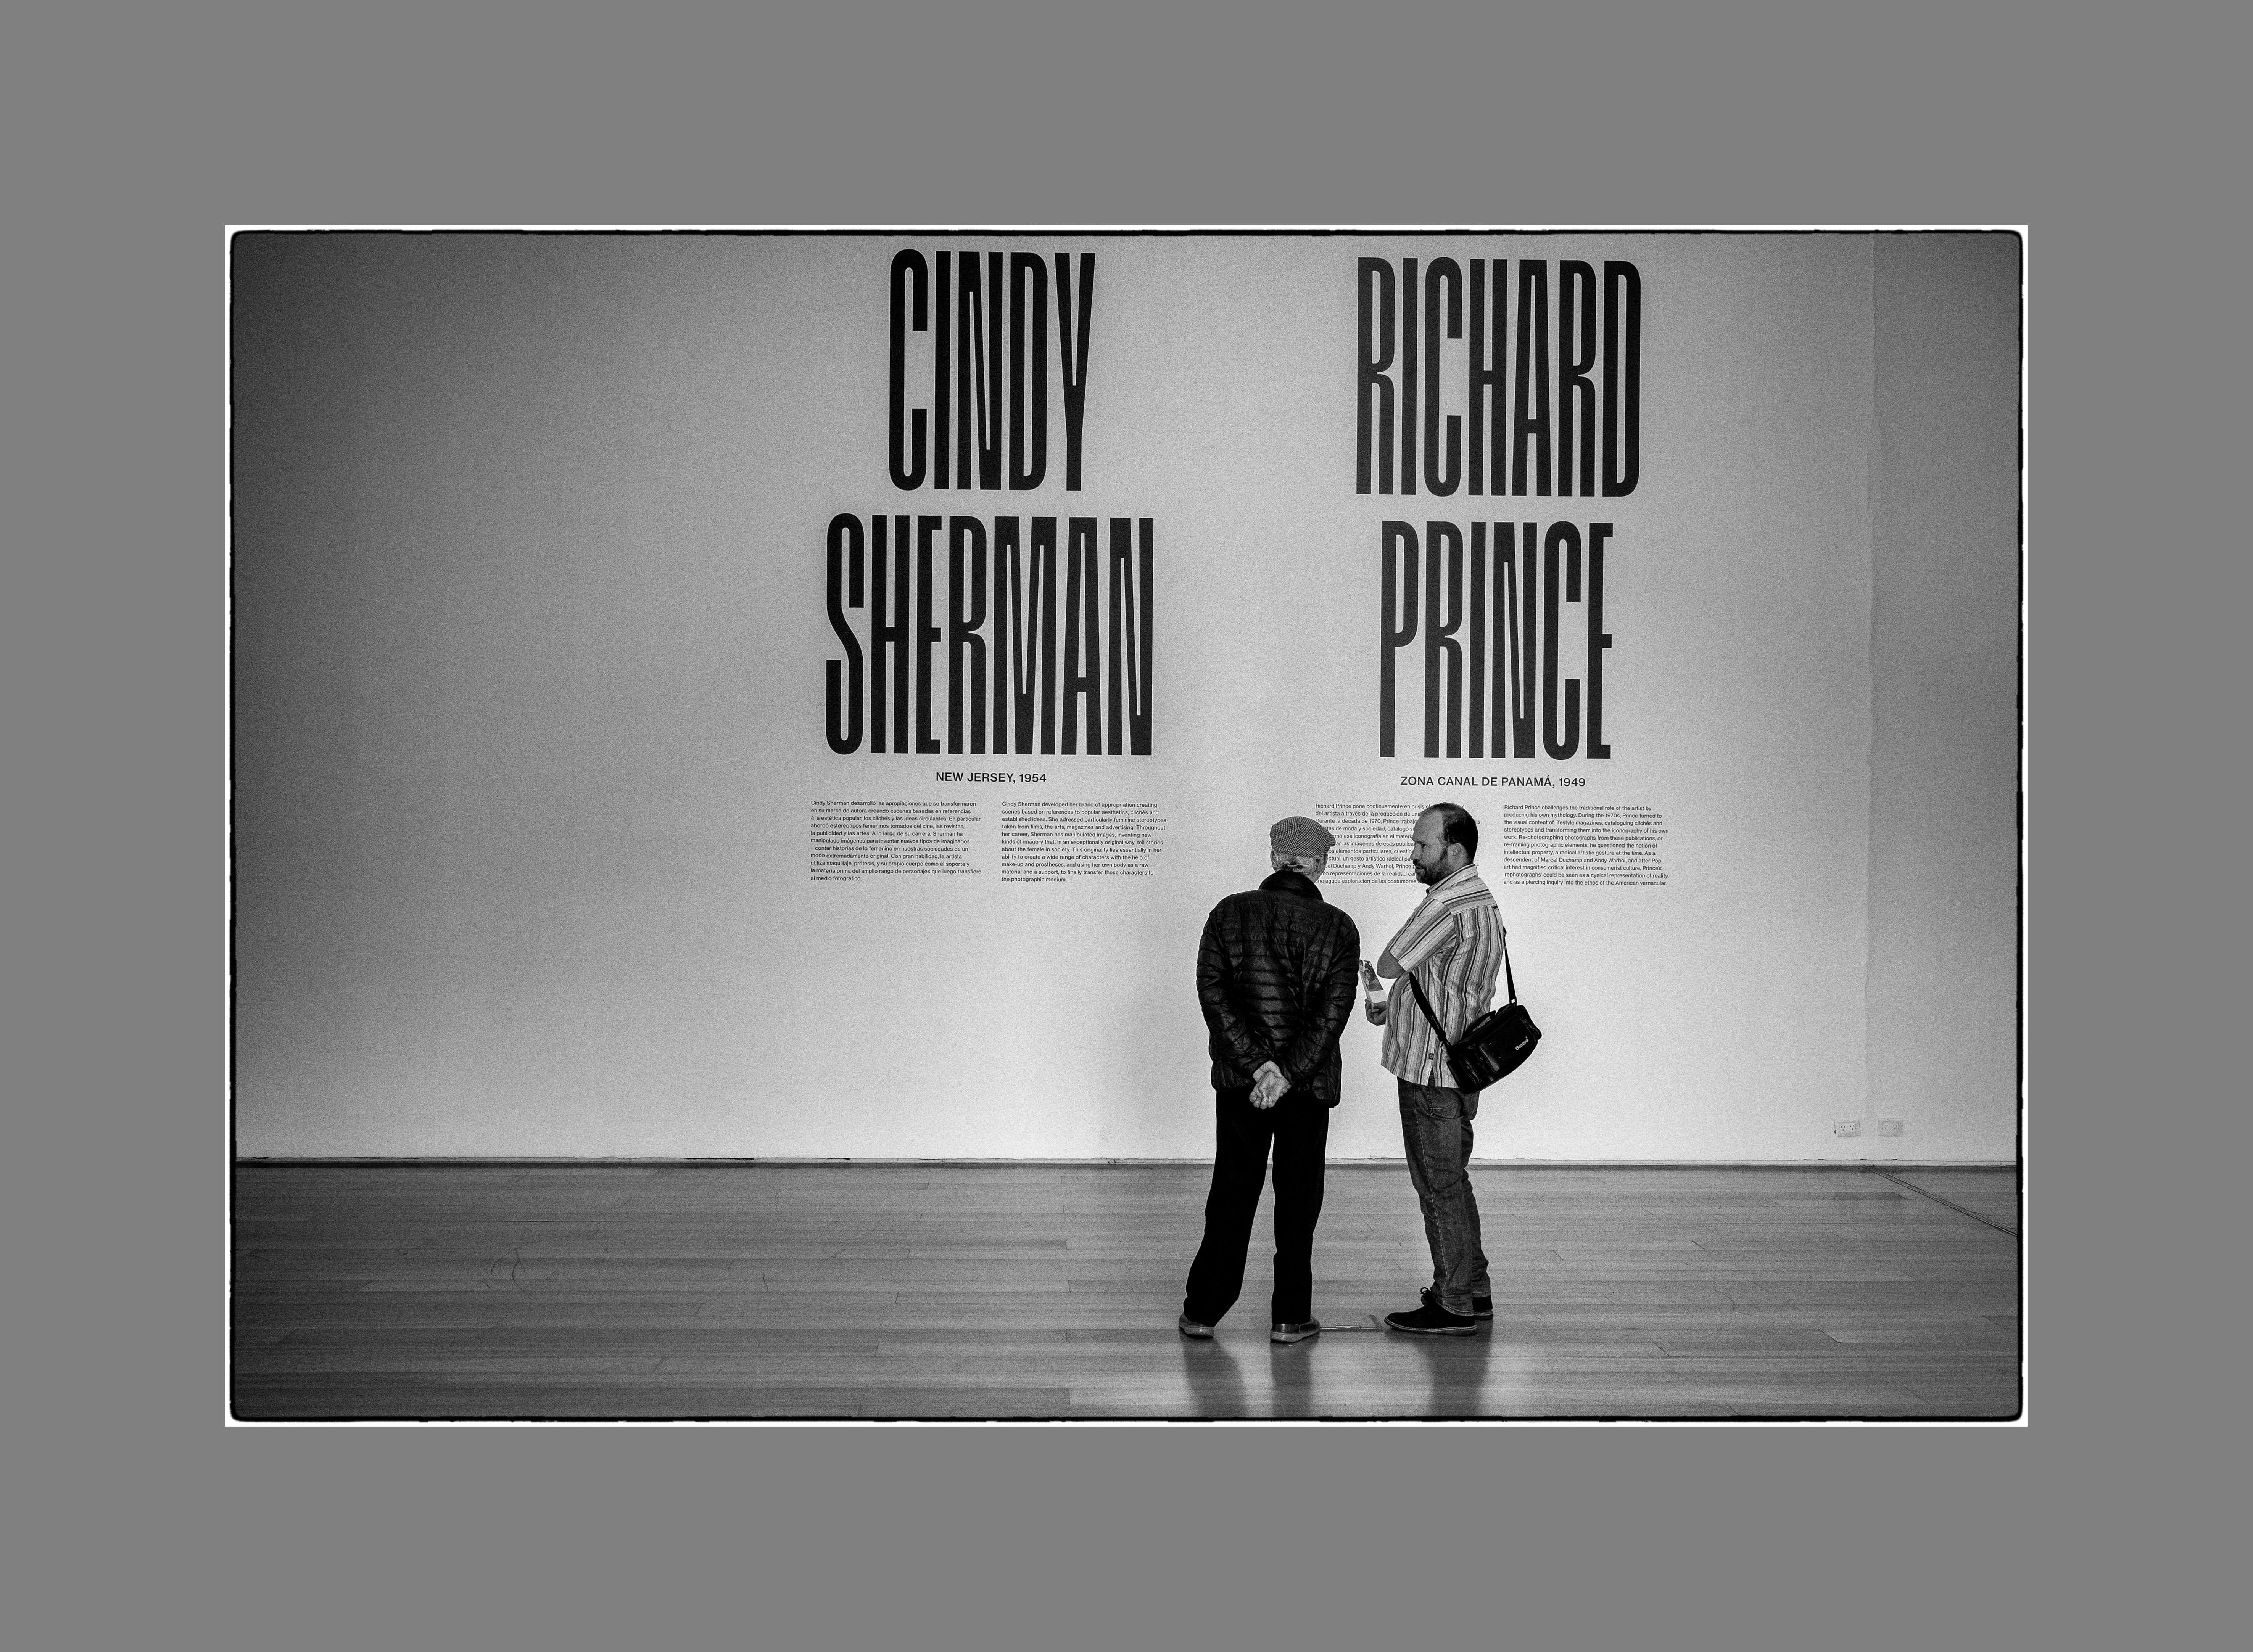 Galería CINDY SHERMAN – RICHARD PRINCE, Museo MALBA